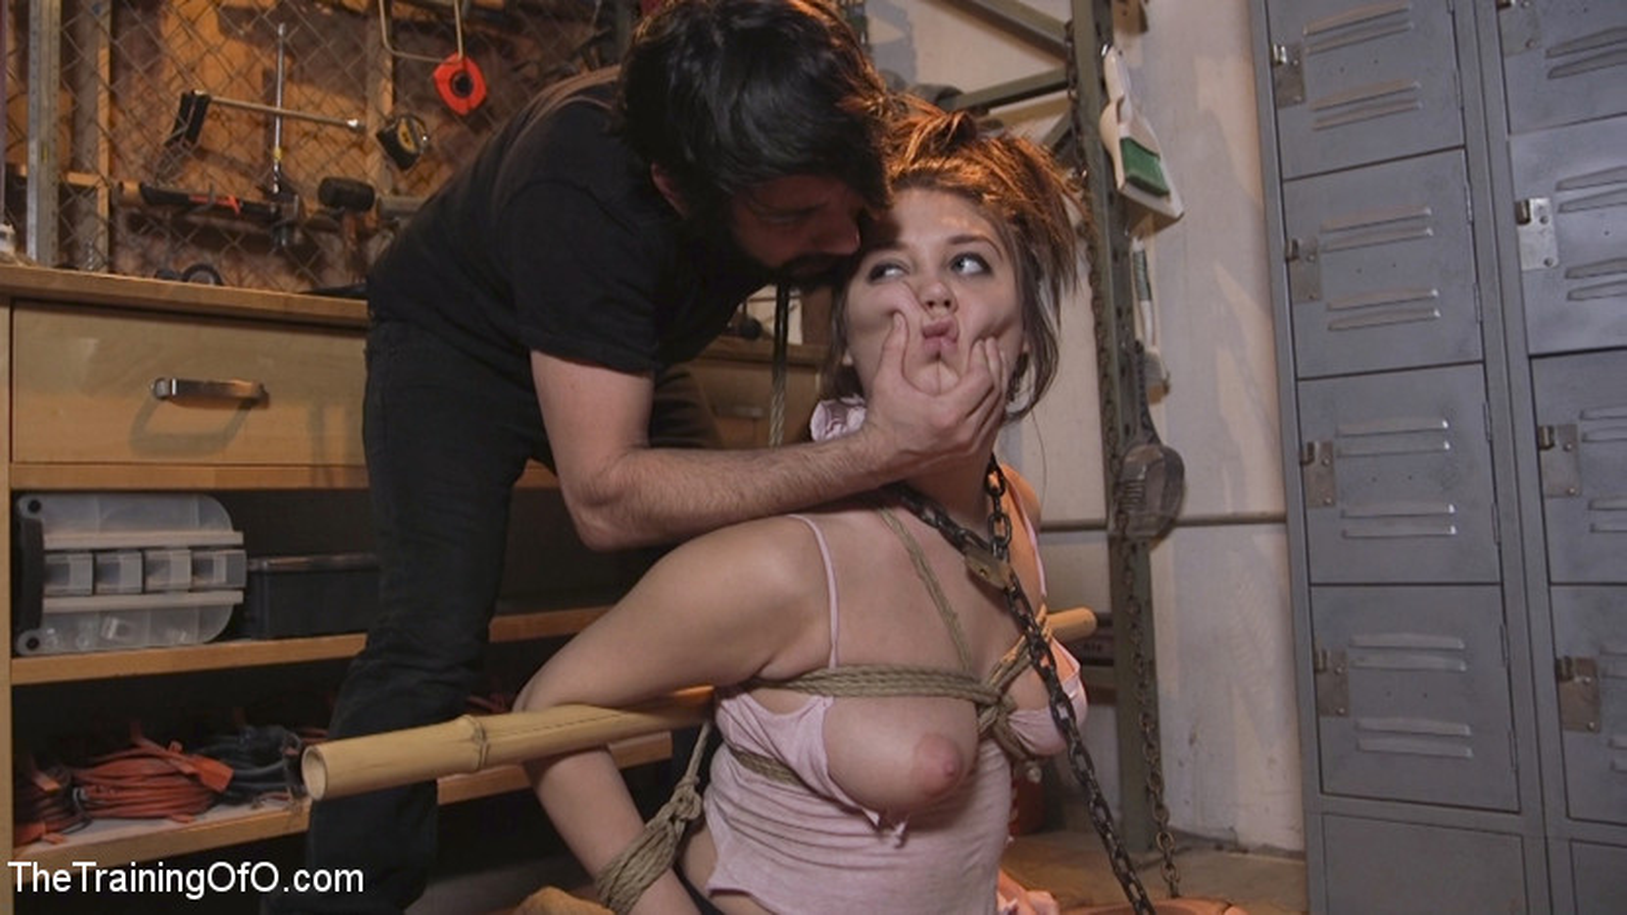 Submissive Young Slut JoJo Kiss Endures Deep Anal Training